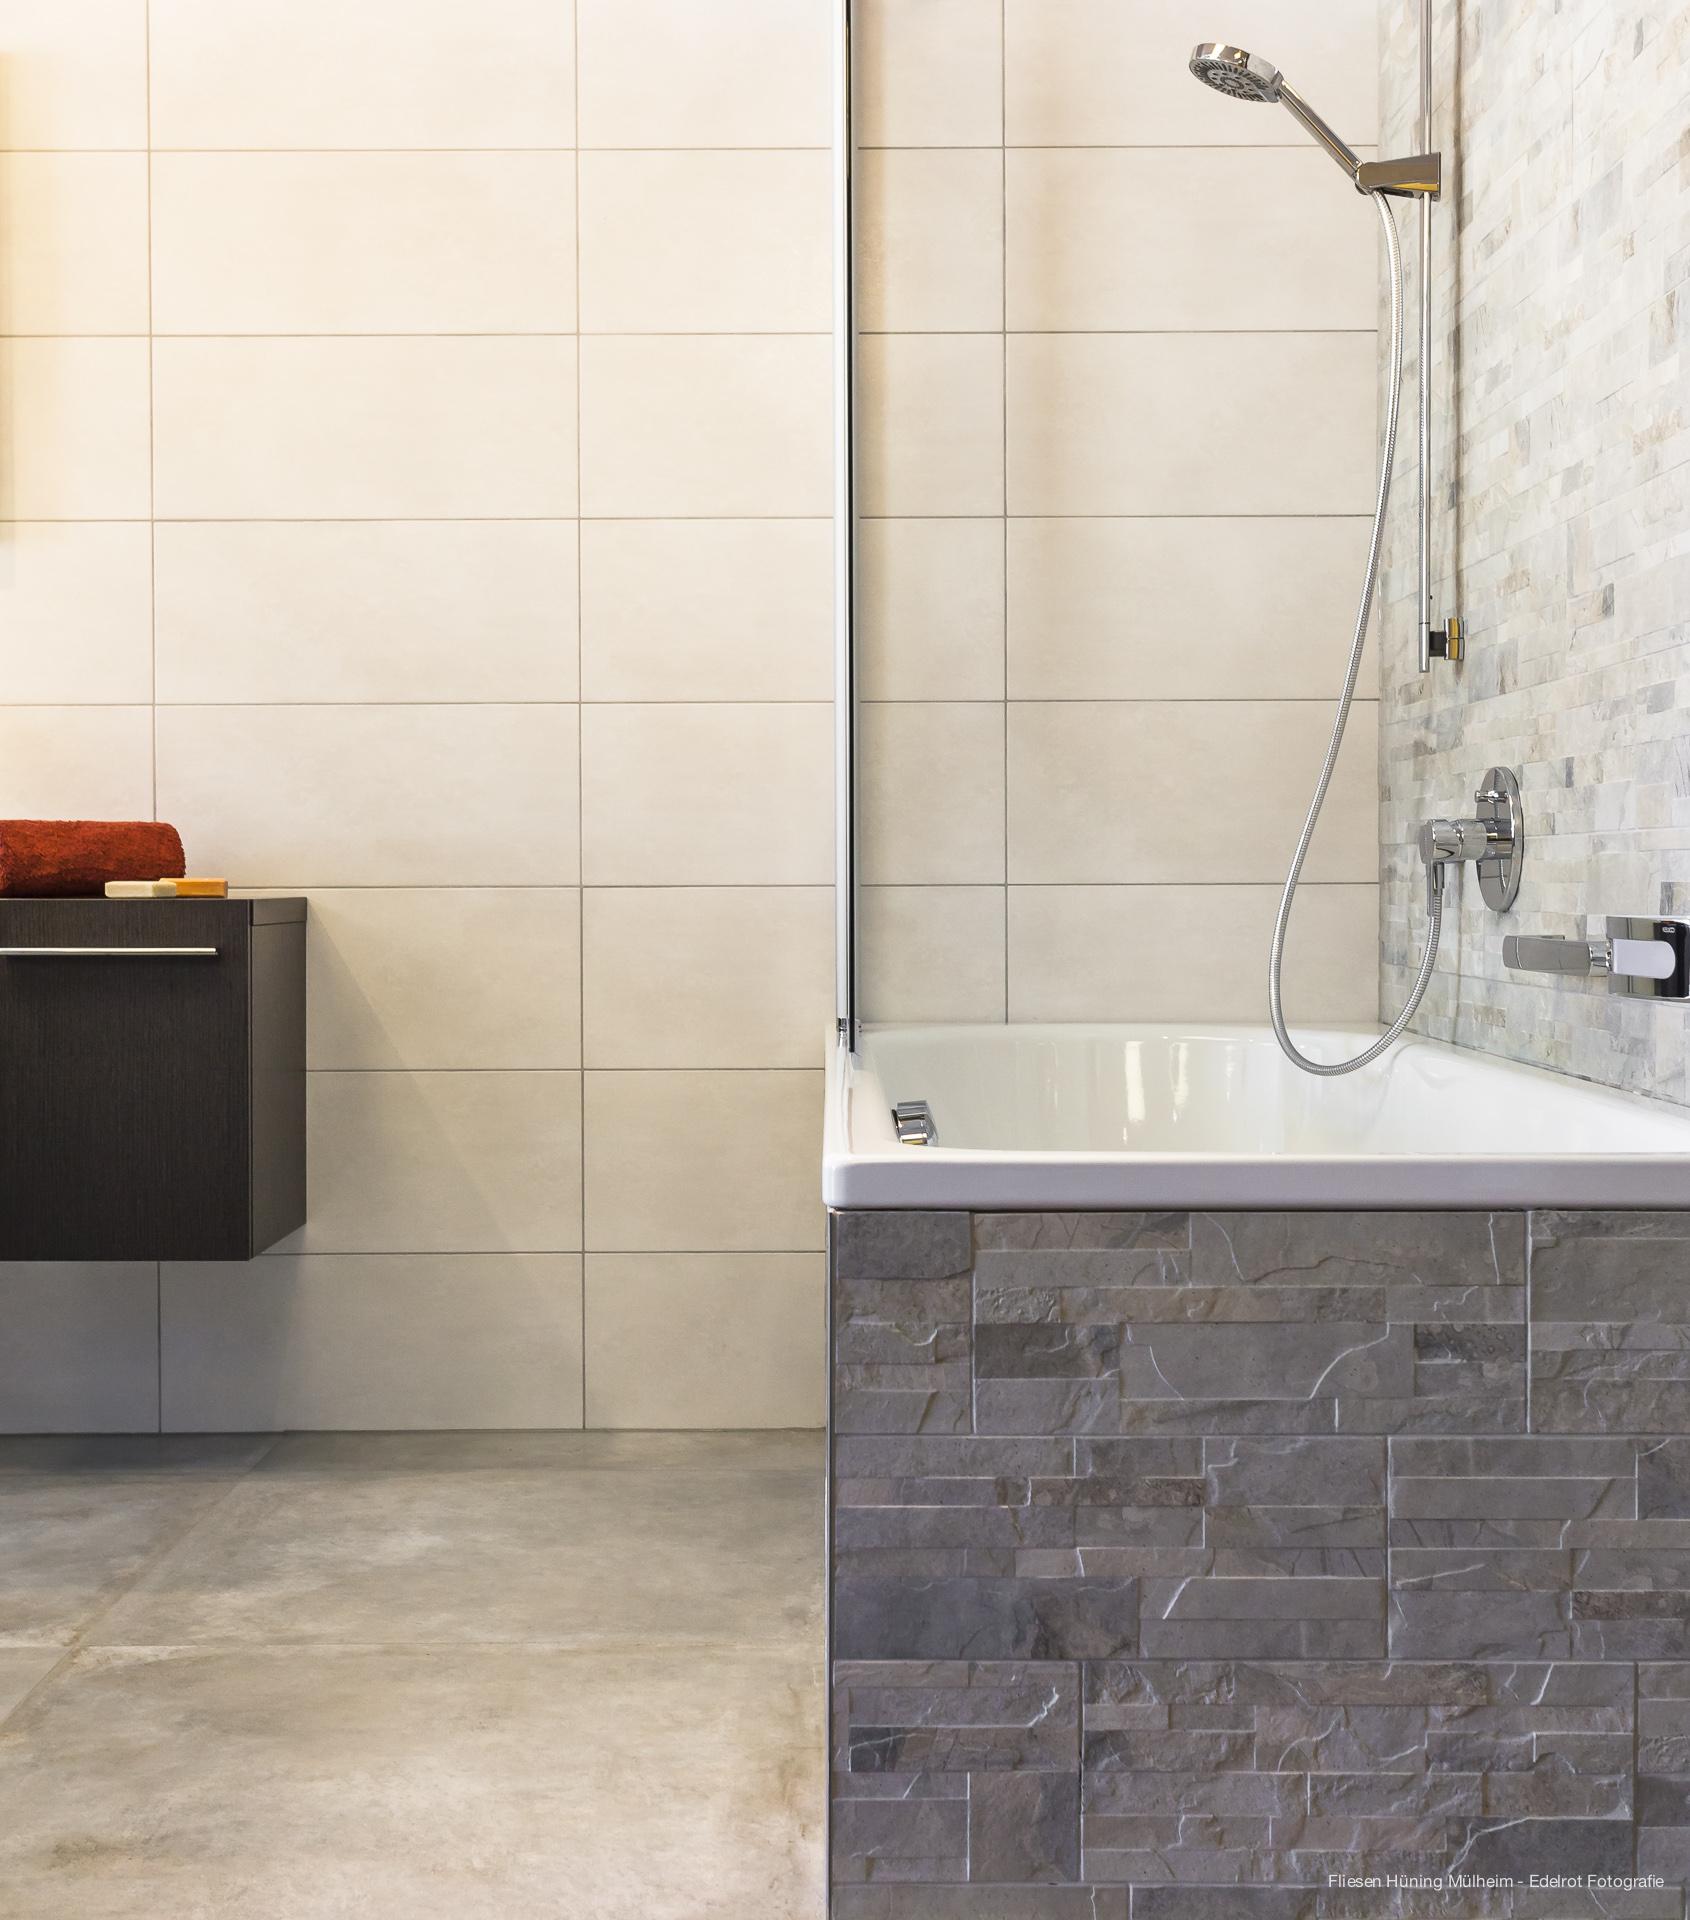 awesome fliesen m lheim an der ruhr photos. Black Bedroom Furniture Sets. Home Design Ideas